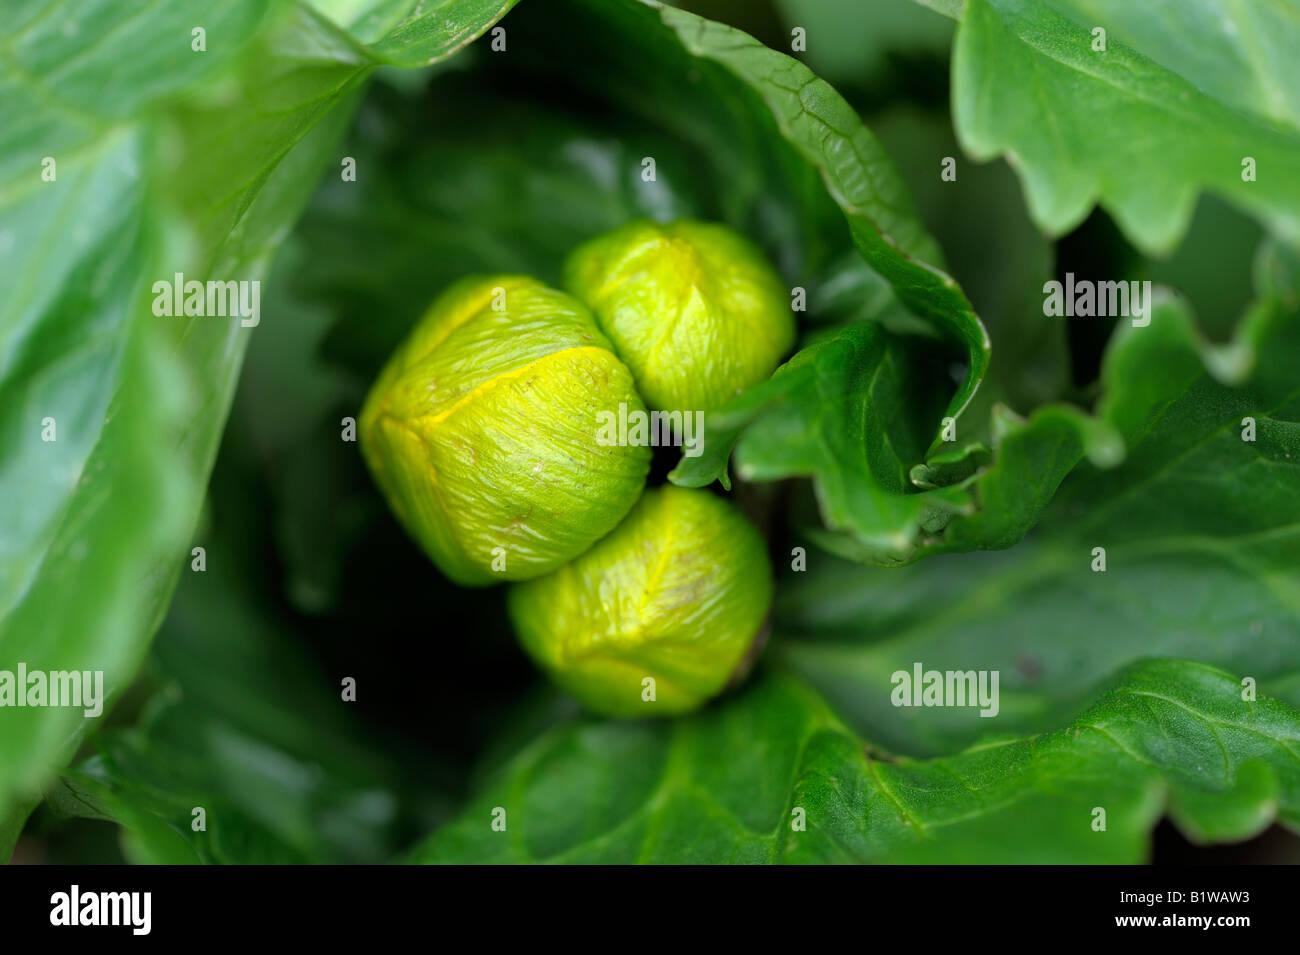 Cabbage Like Stock Photos Amp Cabbage Like Stock Images Alamy